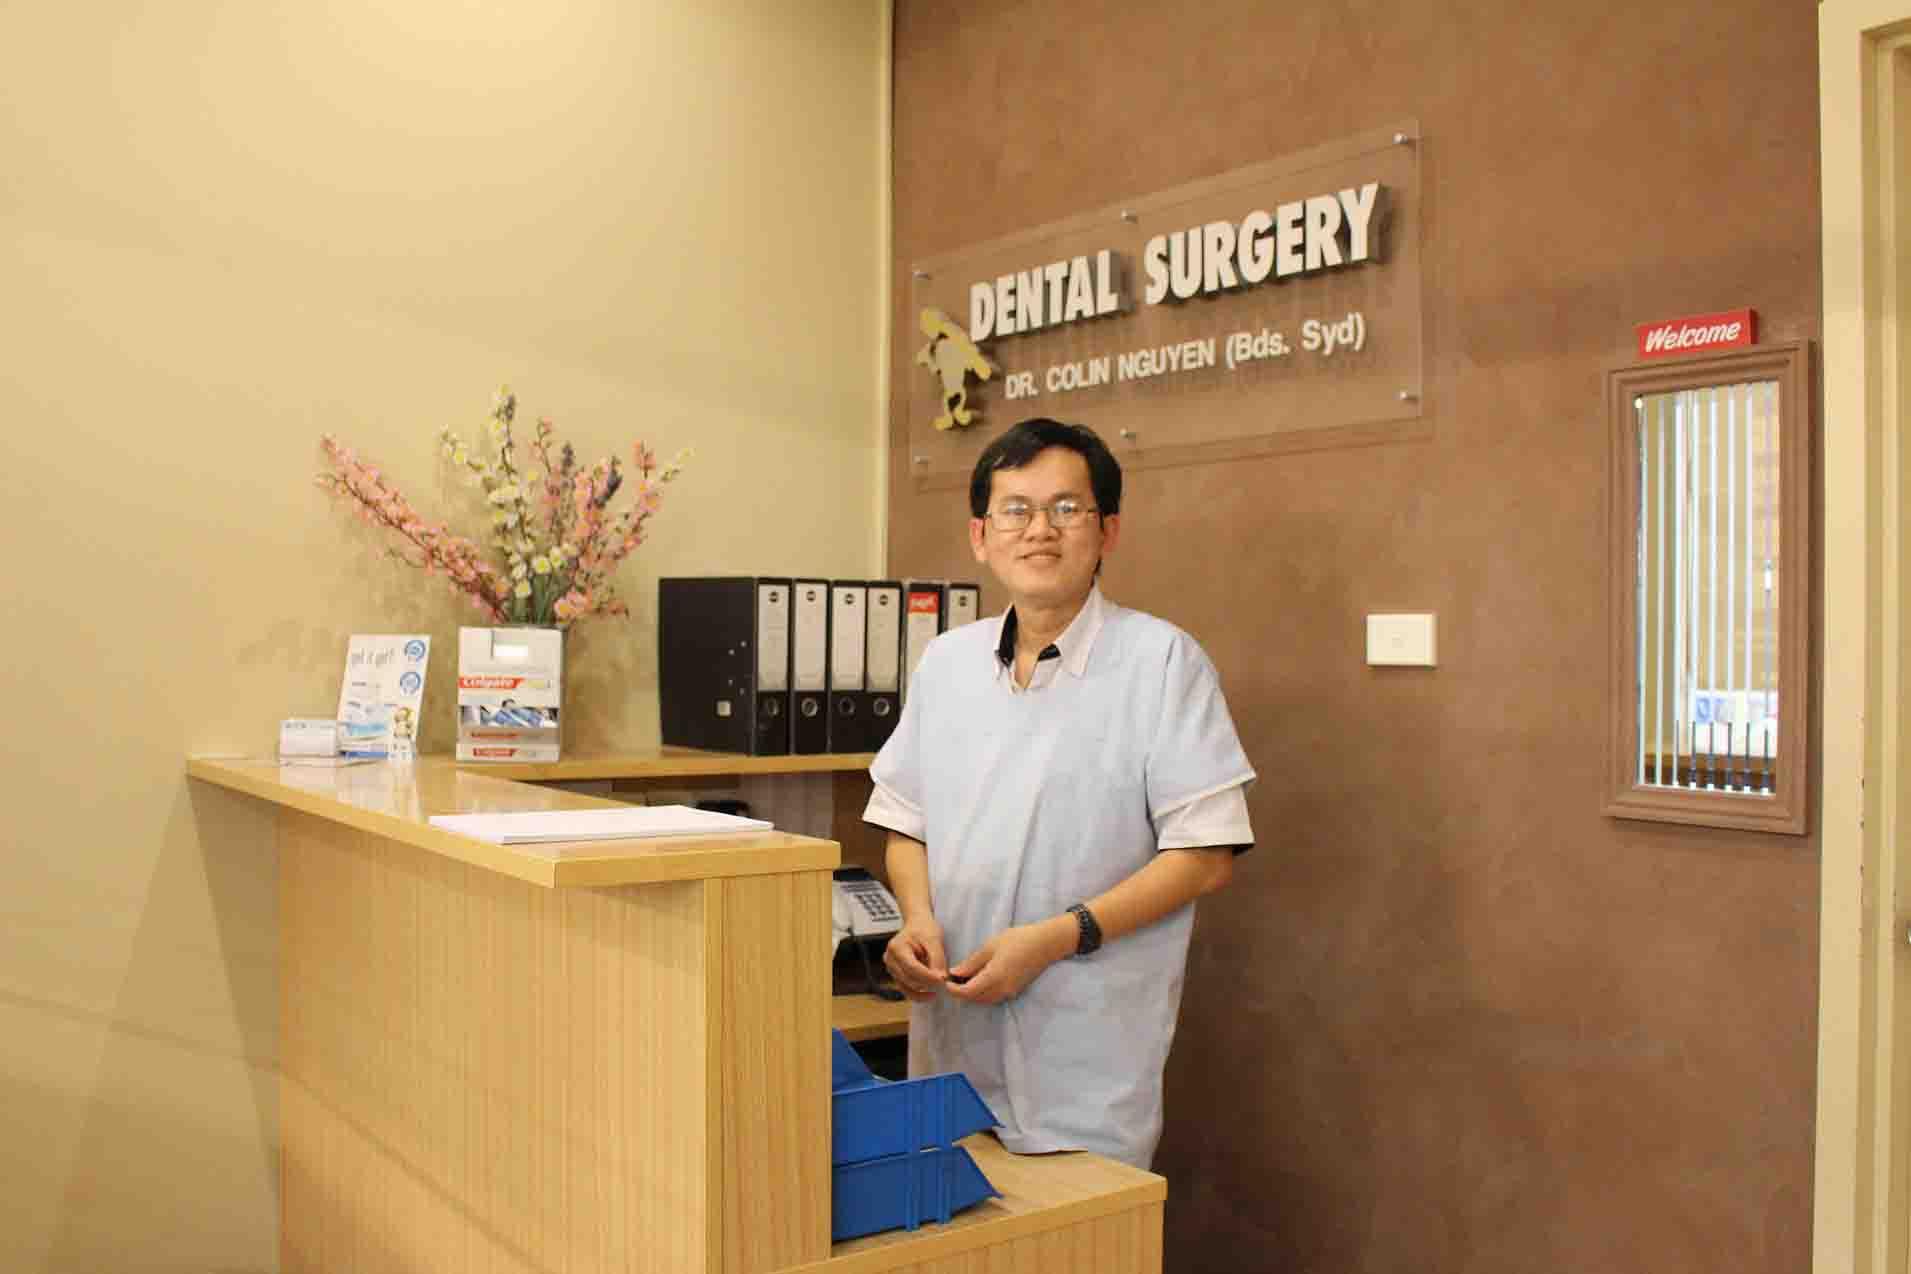 kellyville dental services dentist